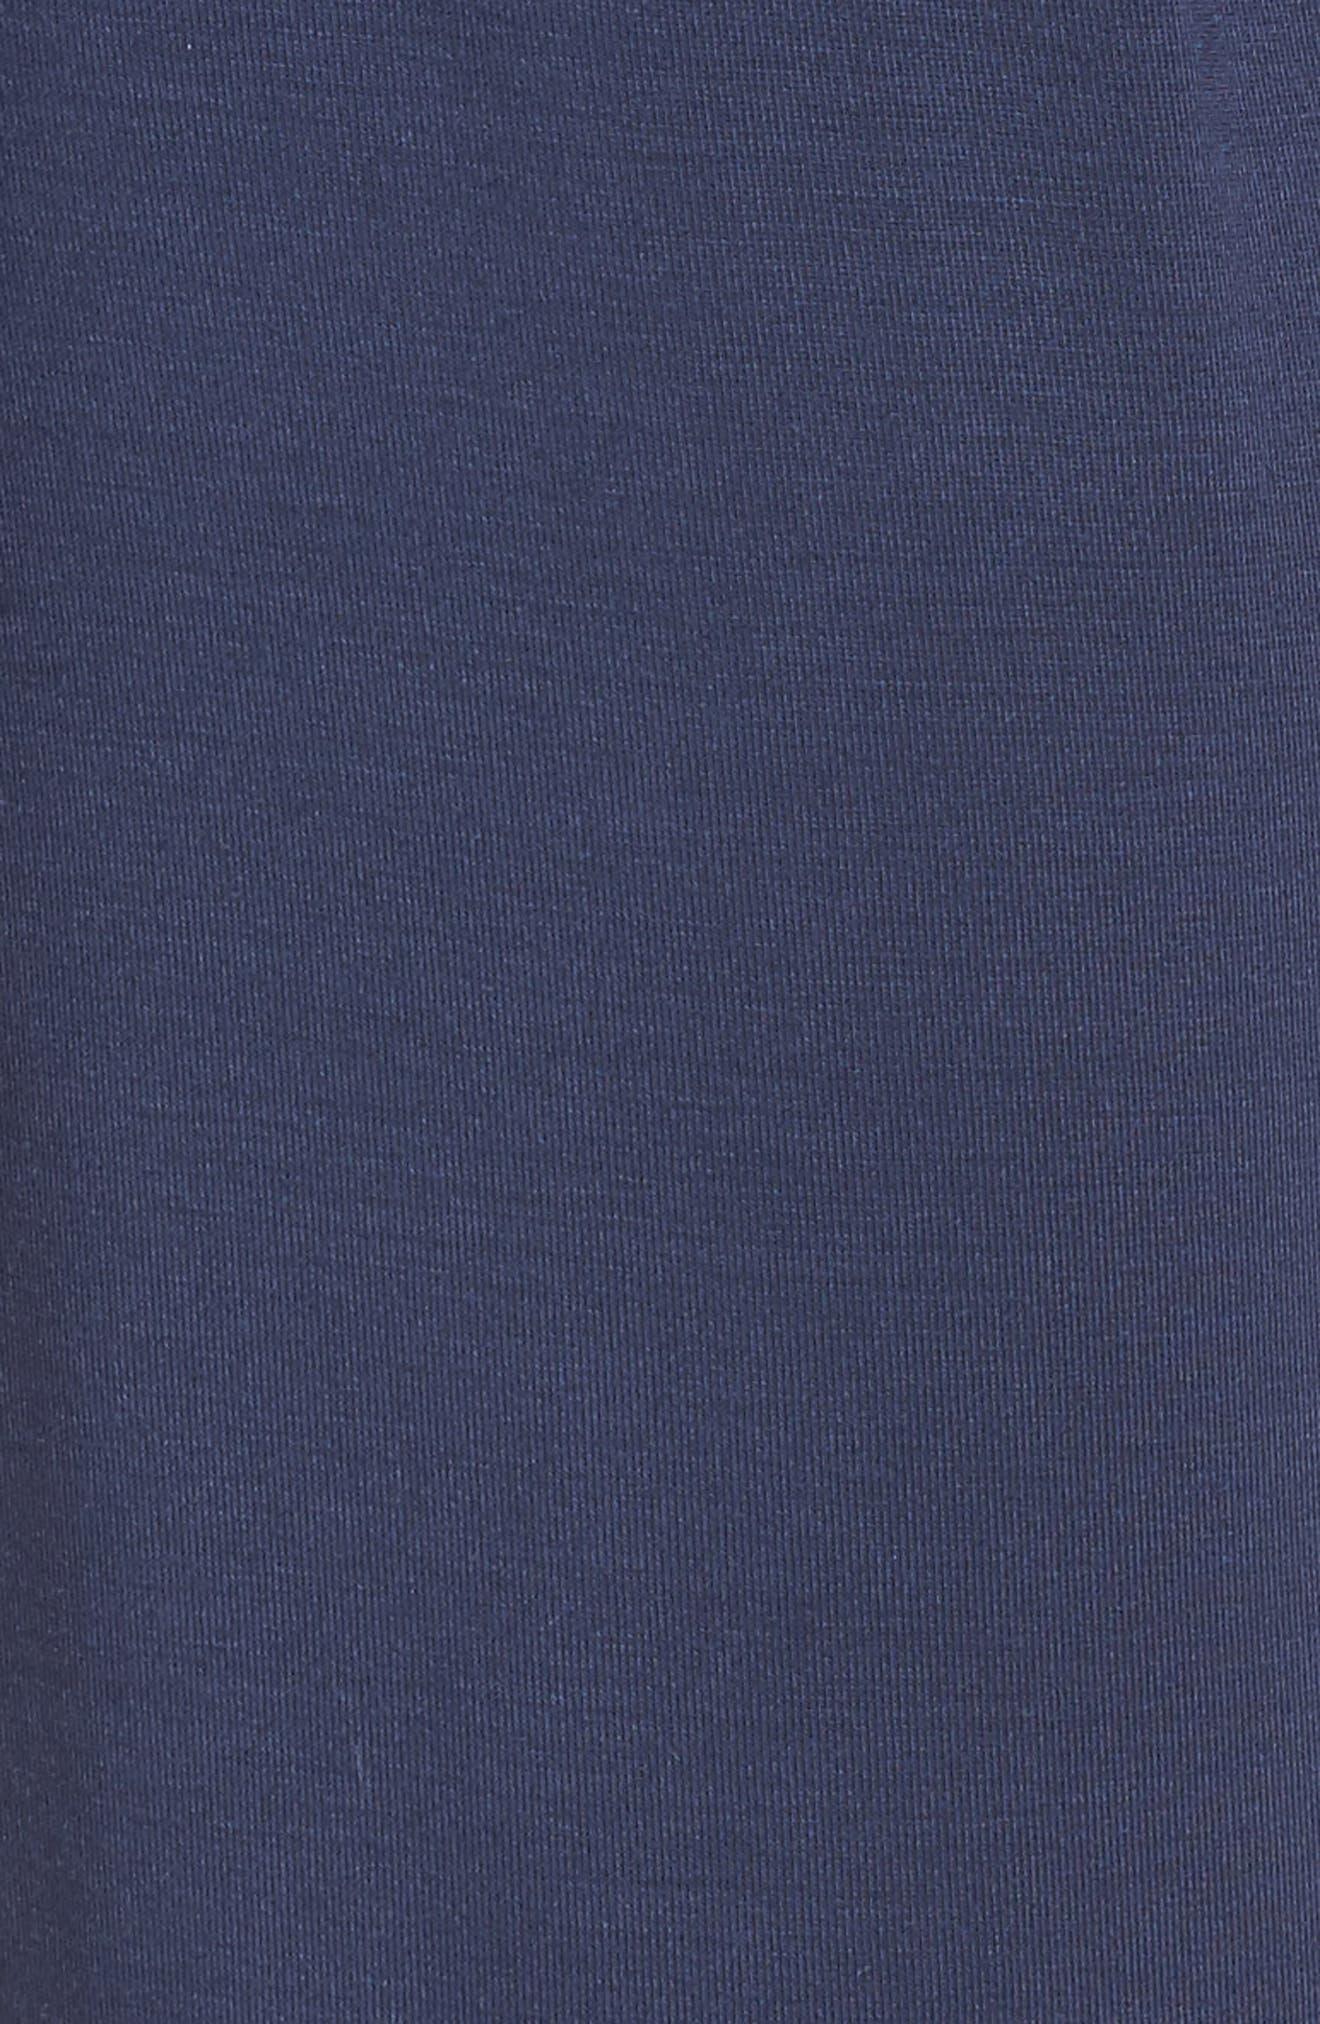 Snuggle Lounge Pants,                             Alternate thumbnail 5, color,                             STEEL BLUE